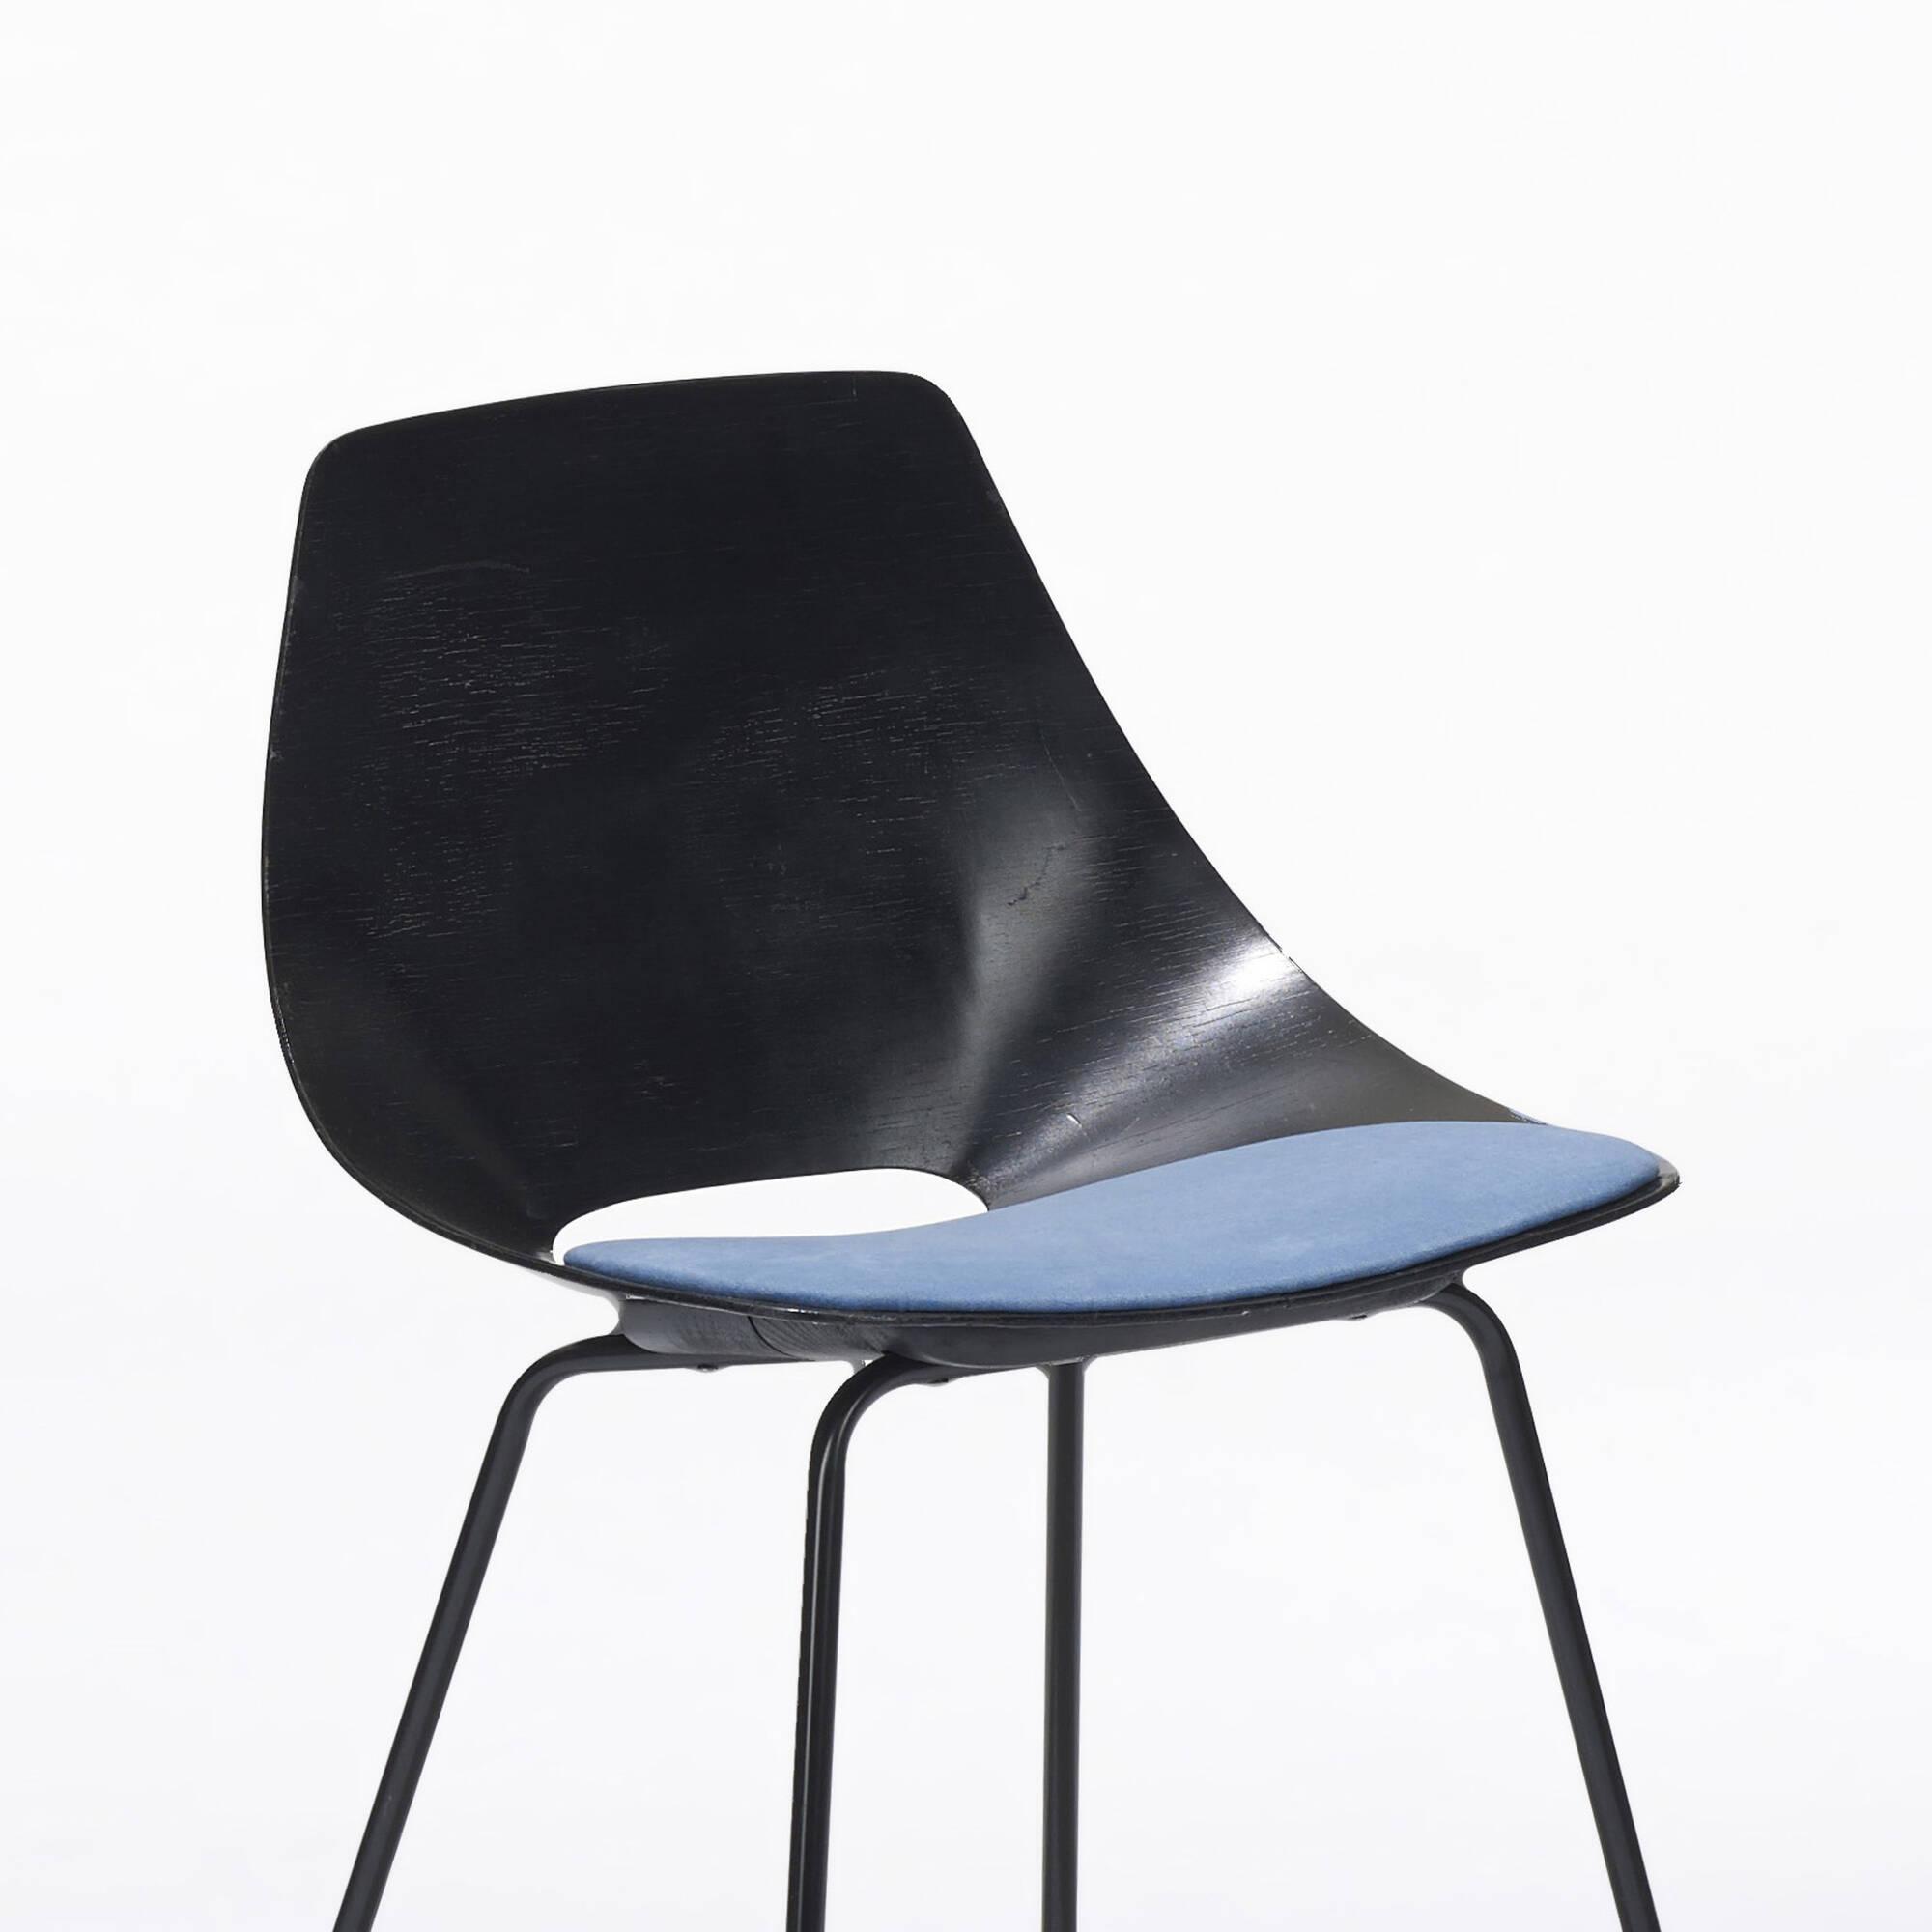 314: Pierre Guariche / Tonneau chairs, set of six (2 of 4)